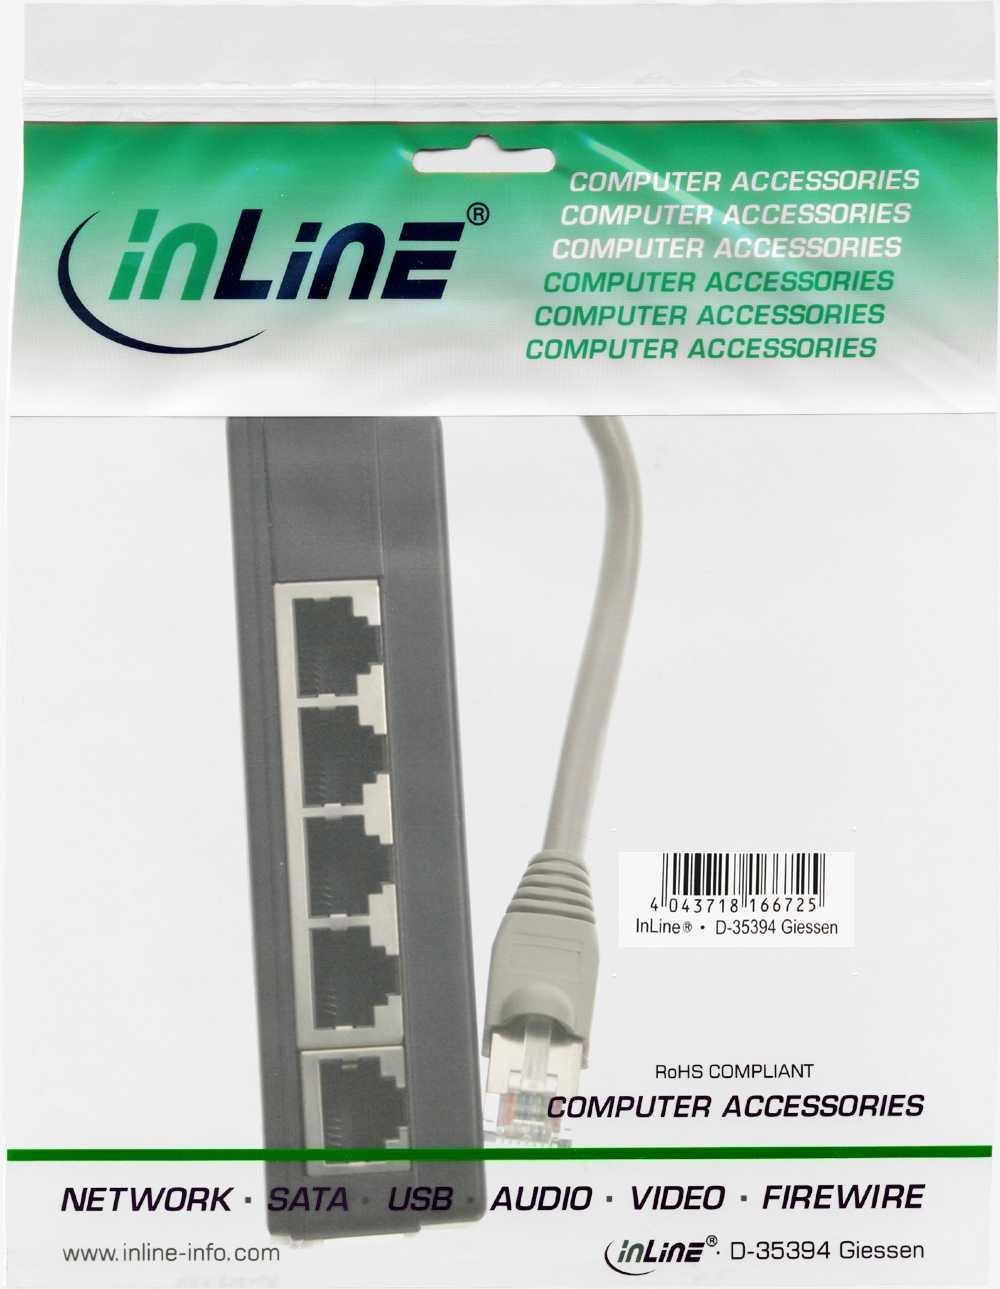 InLine 69935 ISDN Verteiler 5x RJ45 Buchse 15 cm Kabel: Amazon.de ...